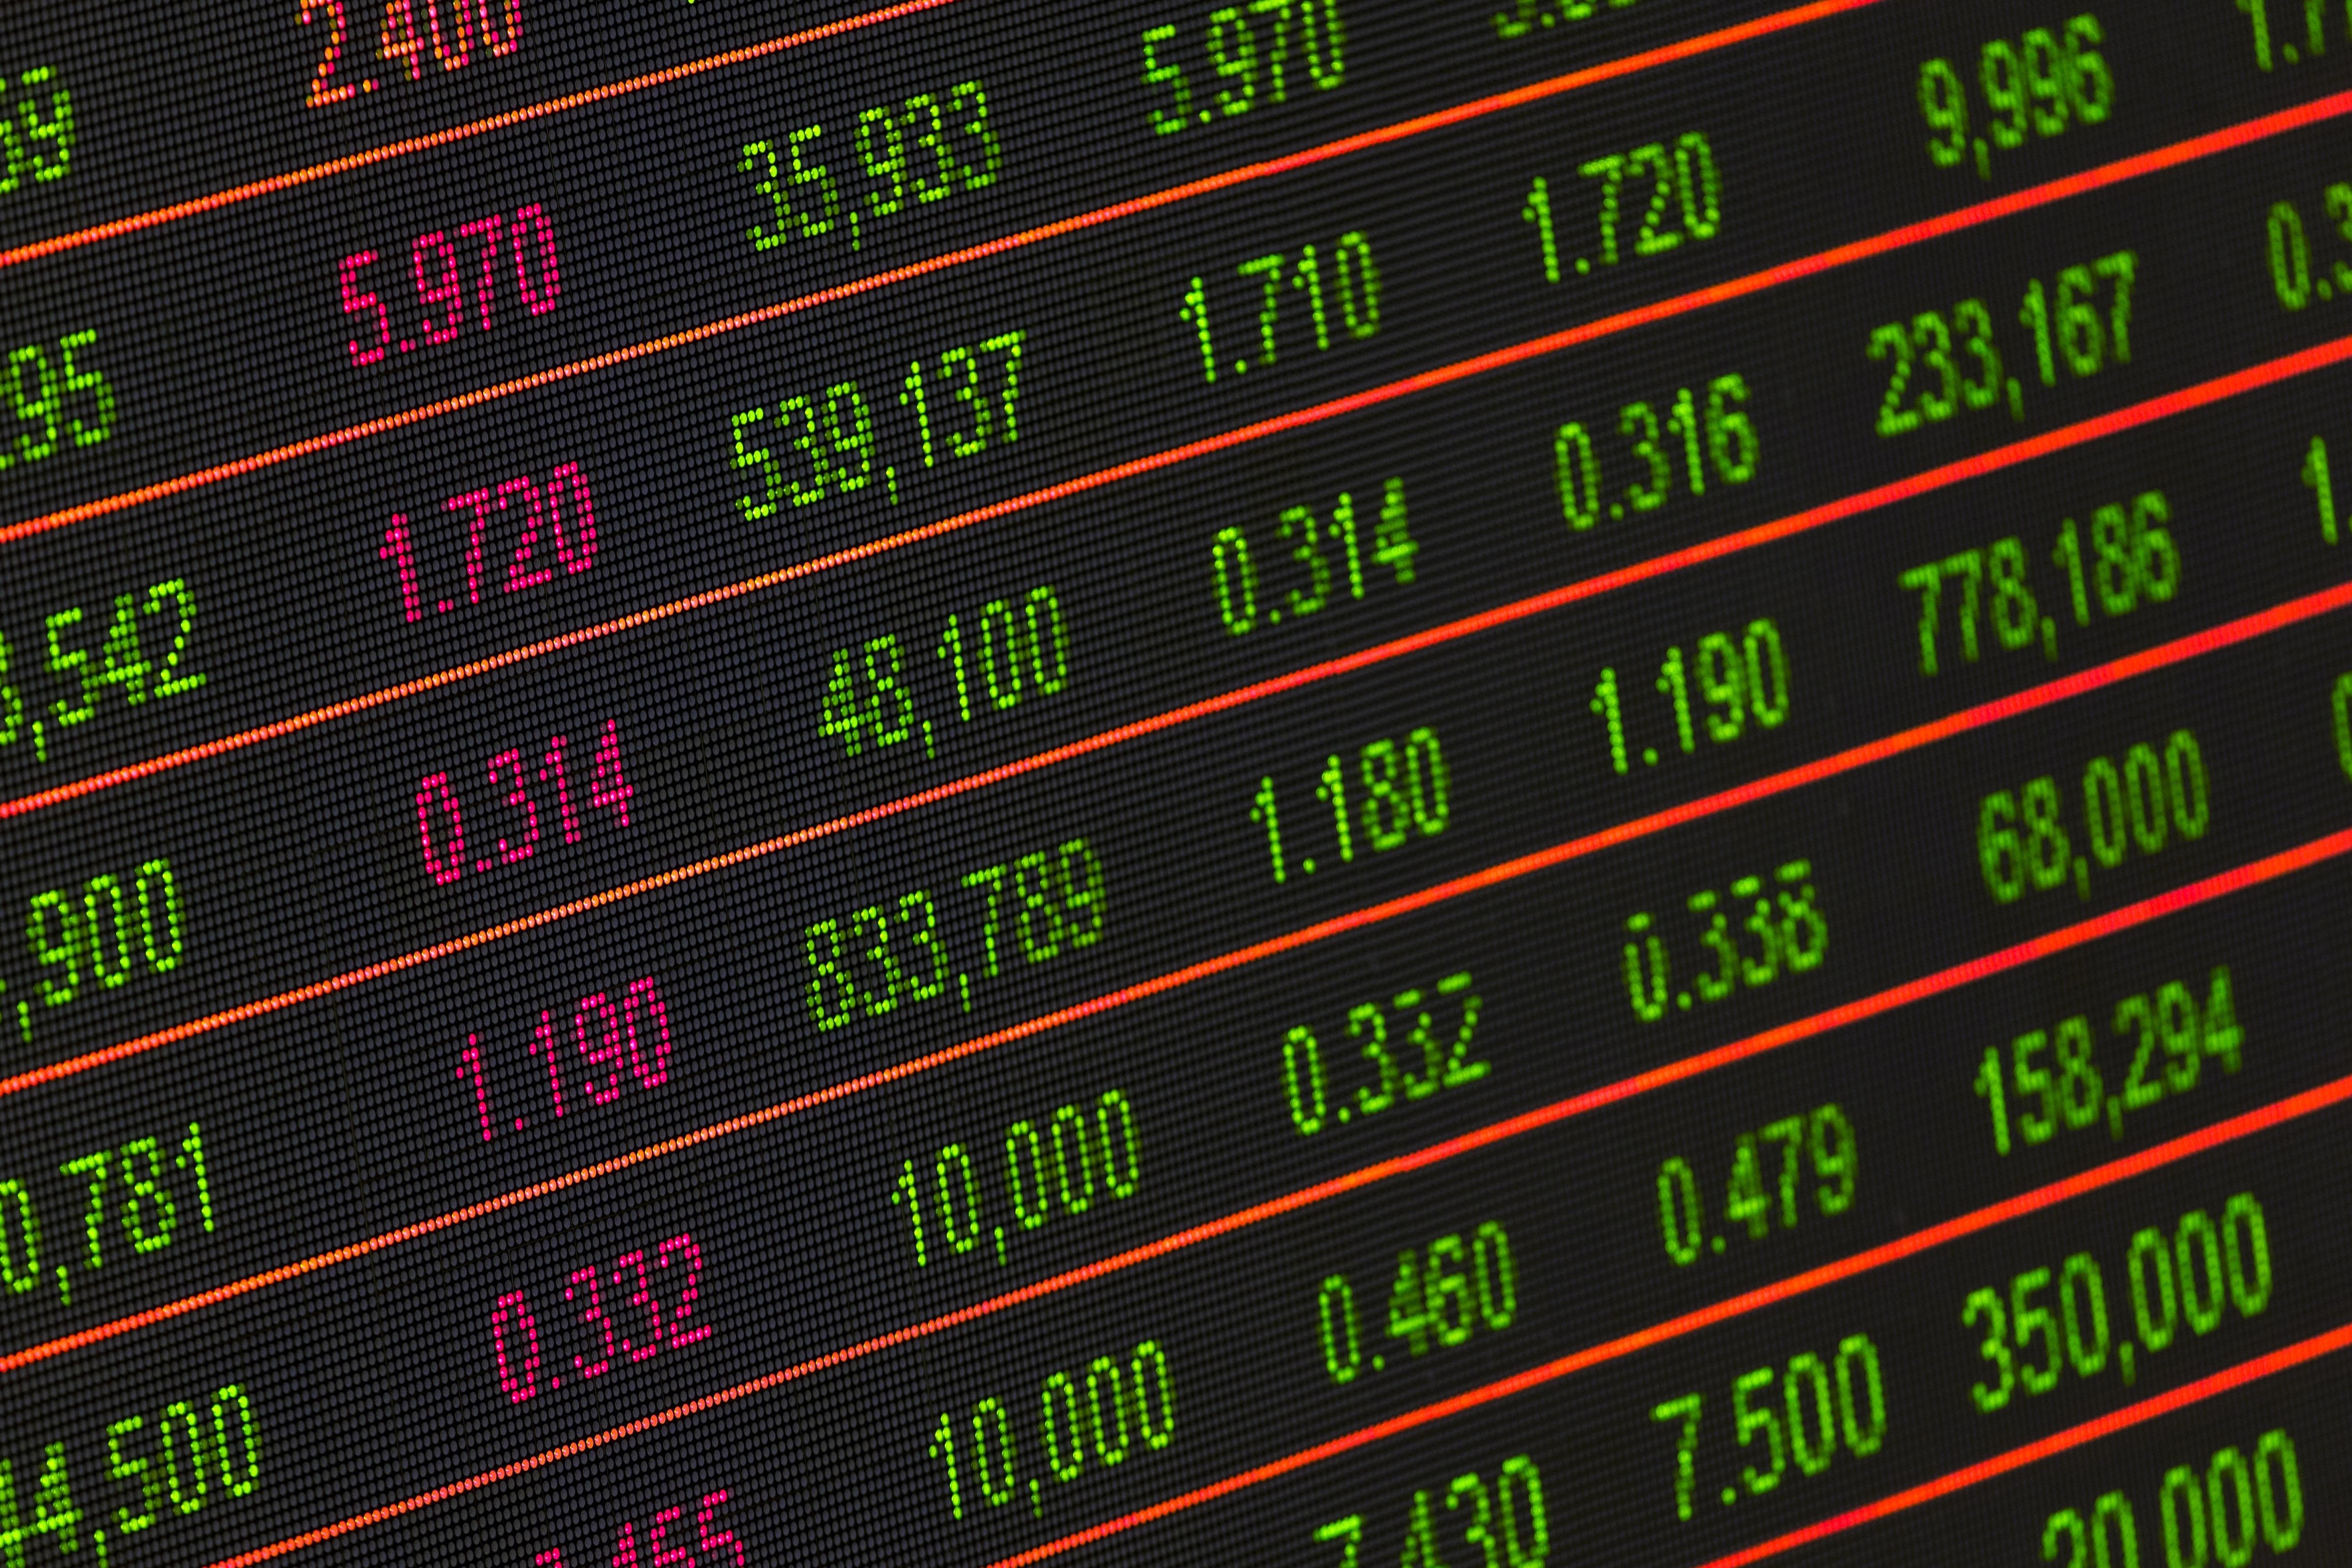 U.S. Stock Markets Set New All-Time Highs Thumbnail